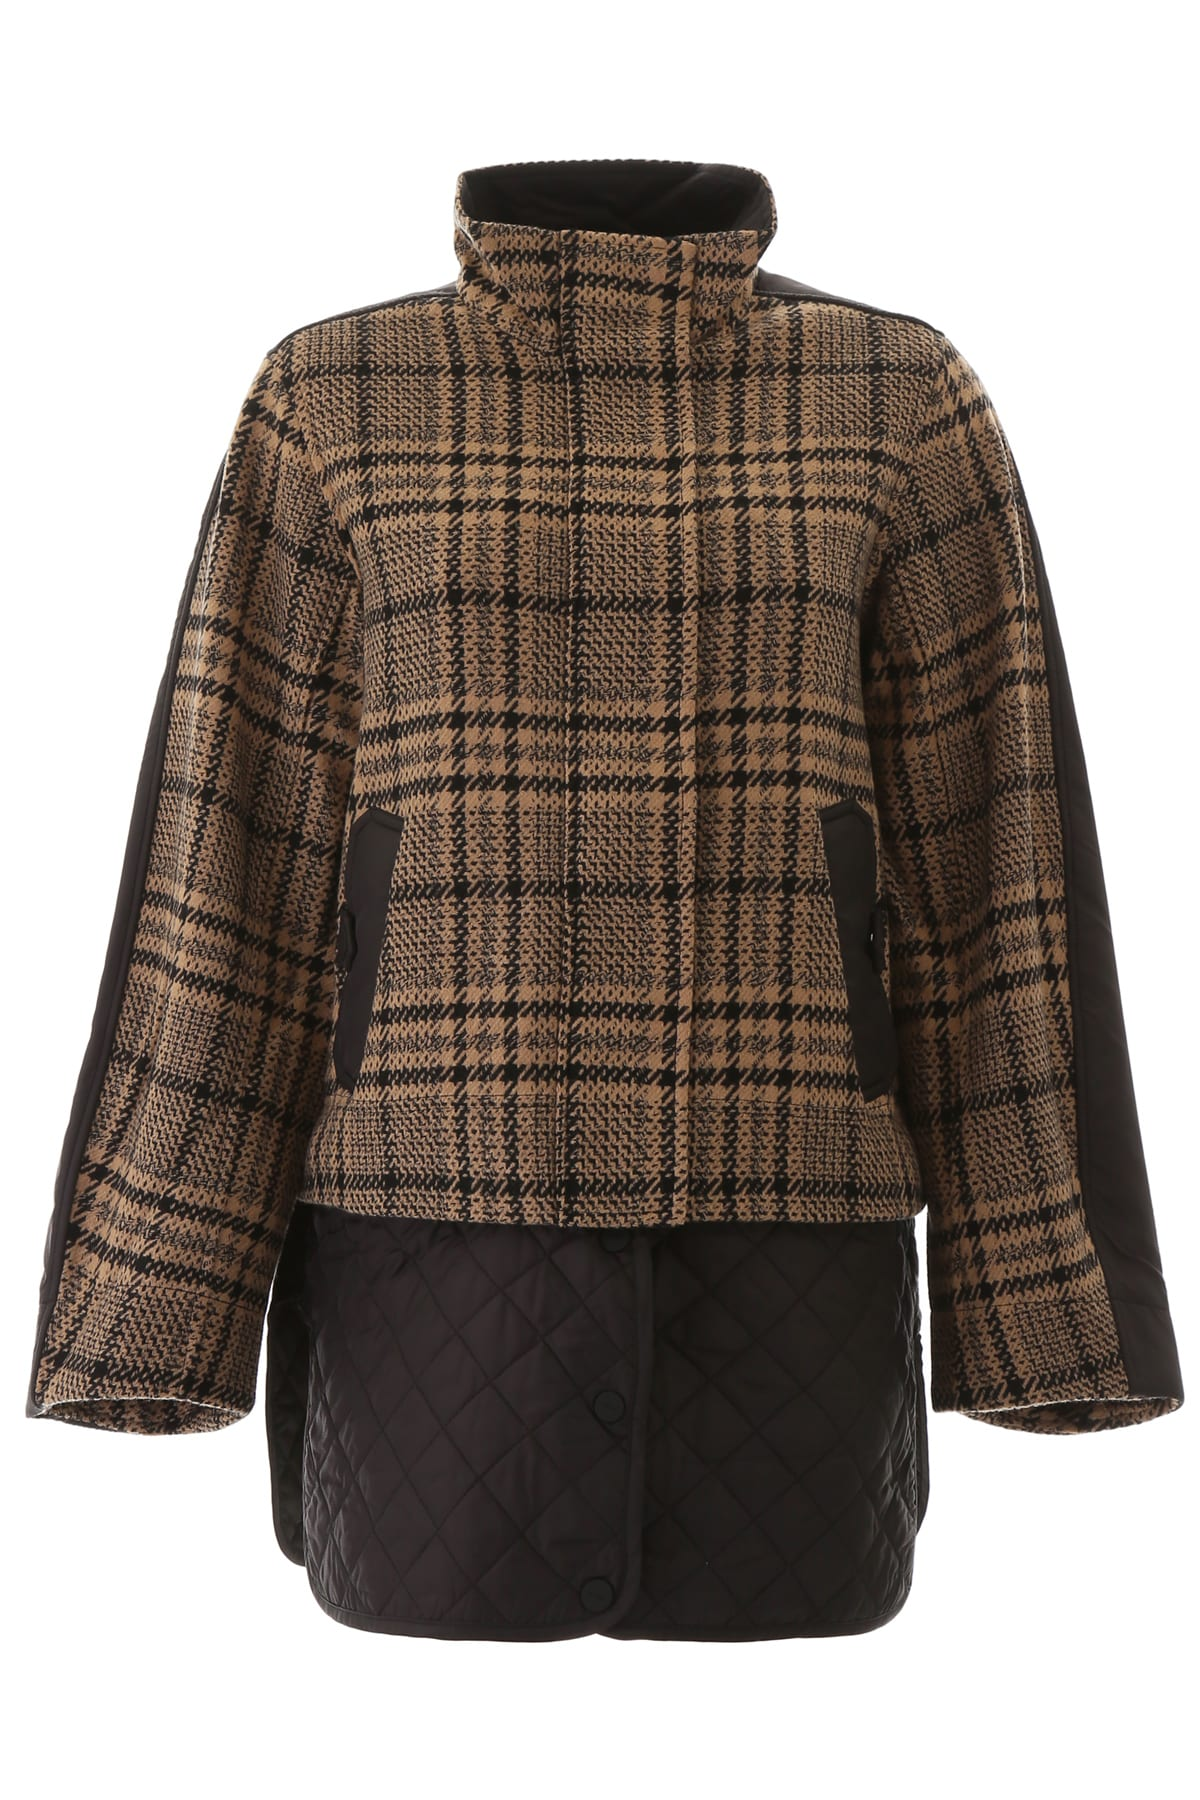 Photo of  Ganni Tartan Wool Jacket- shop Ganni jackets online sales